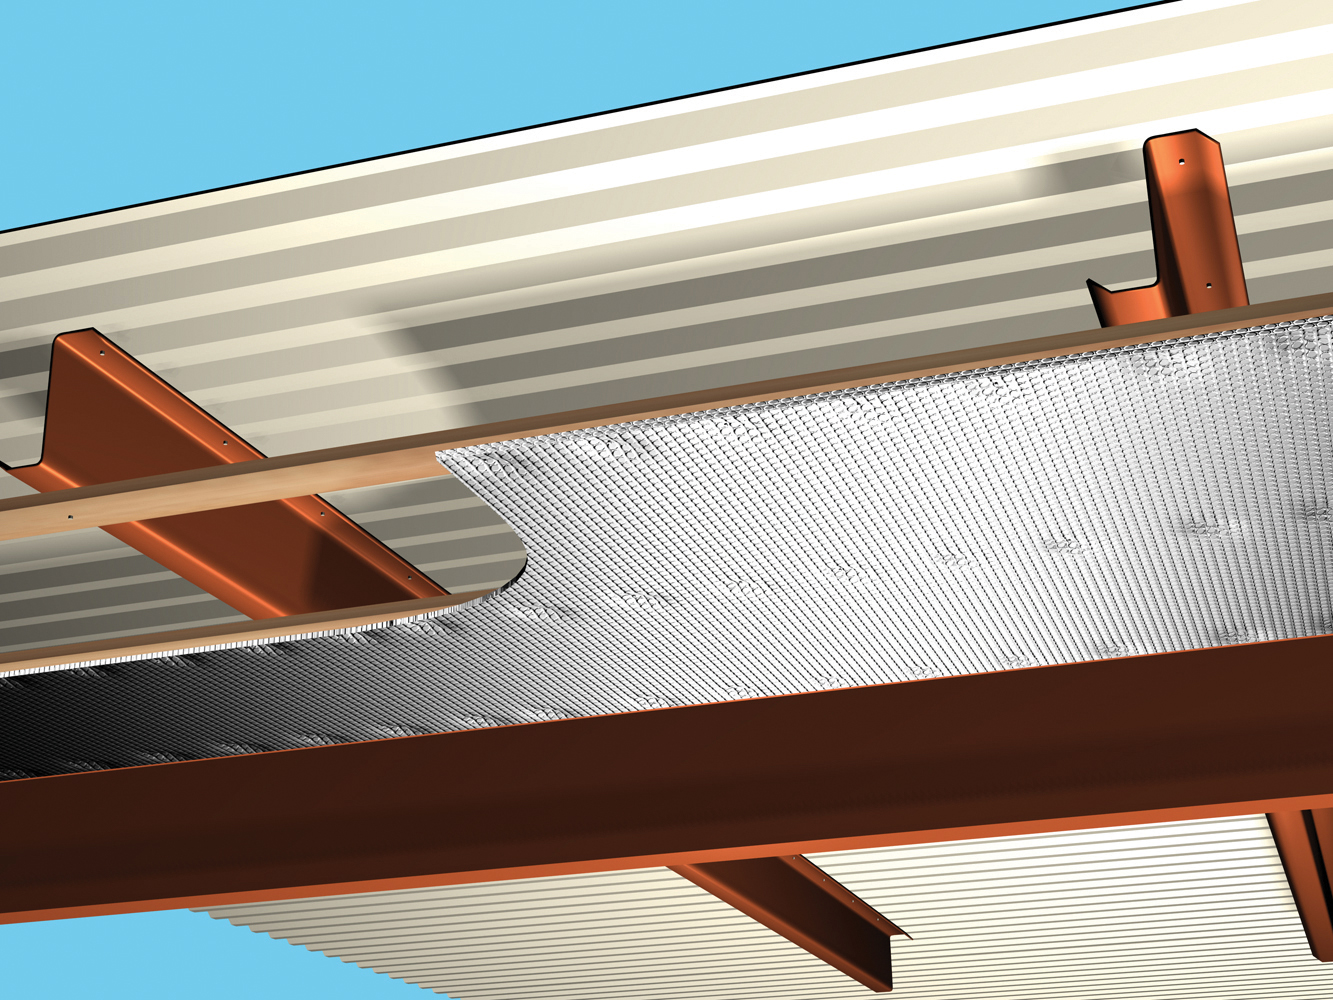 Folie termoizolanta utlilizare - Hale industriale REFLECTIX - Poza 4